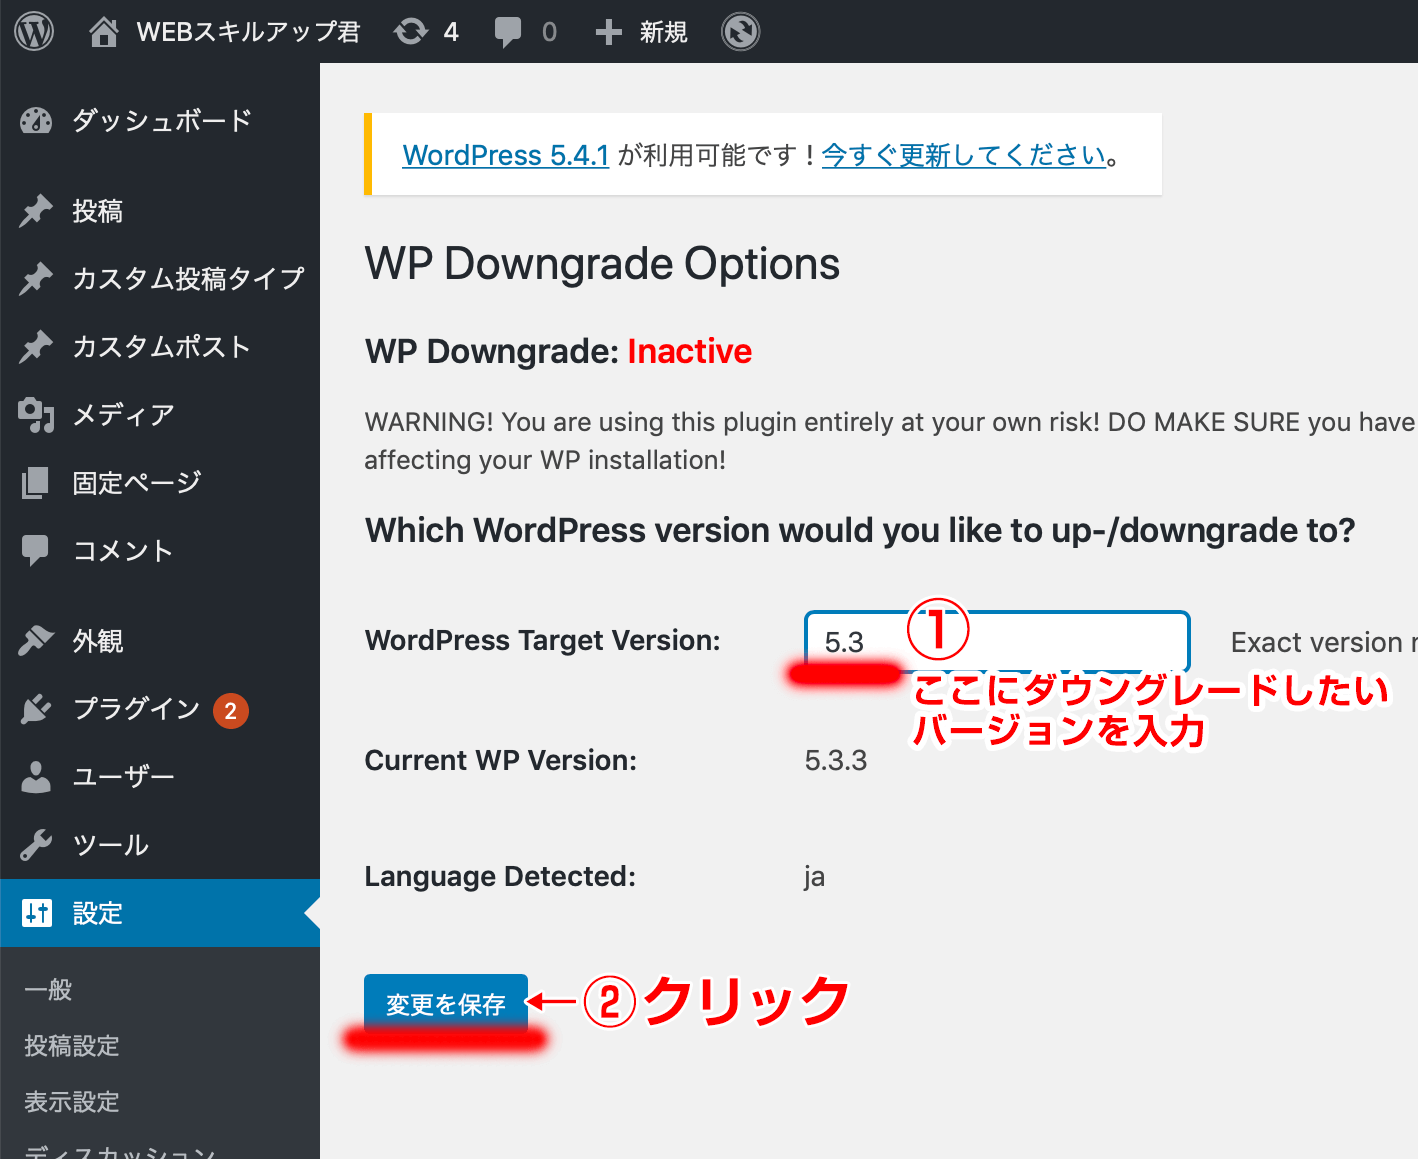 WP Downgrade Options